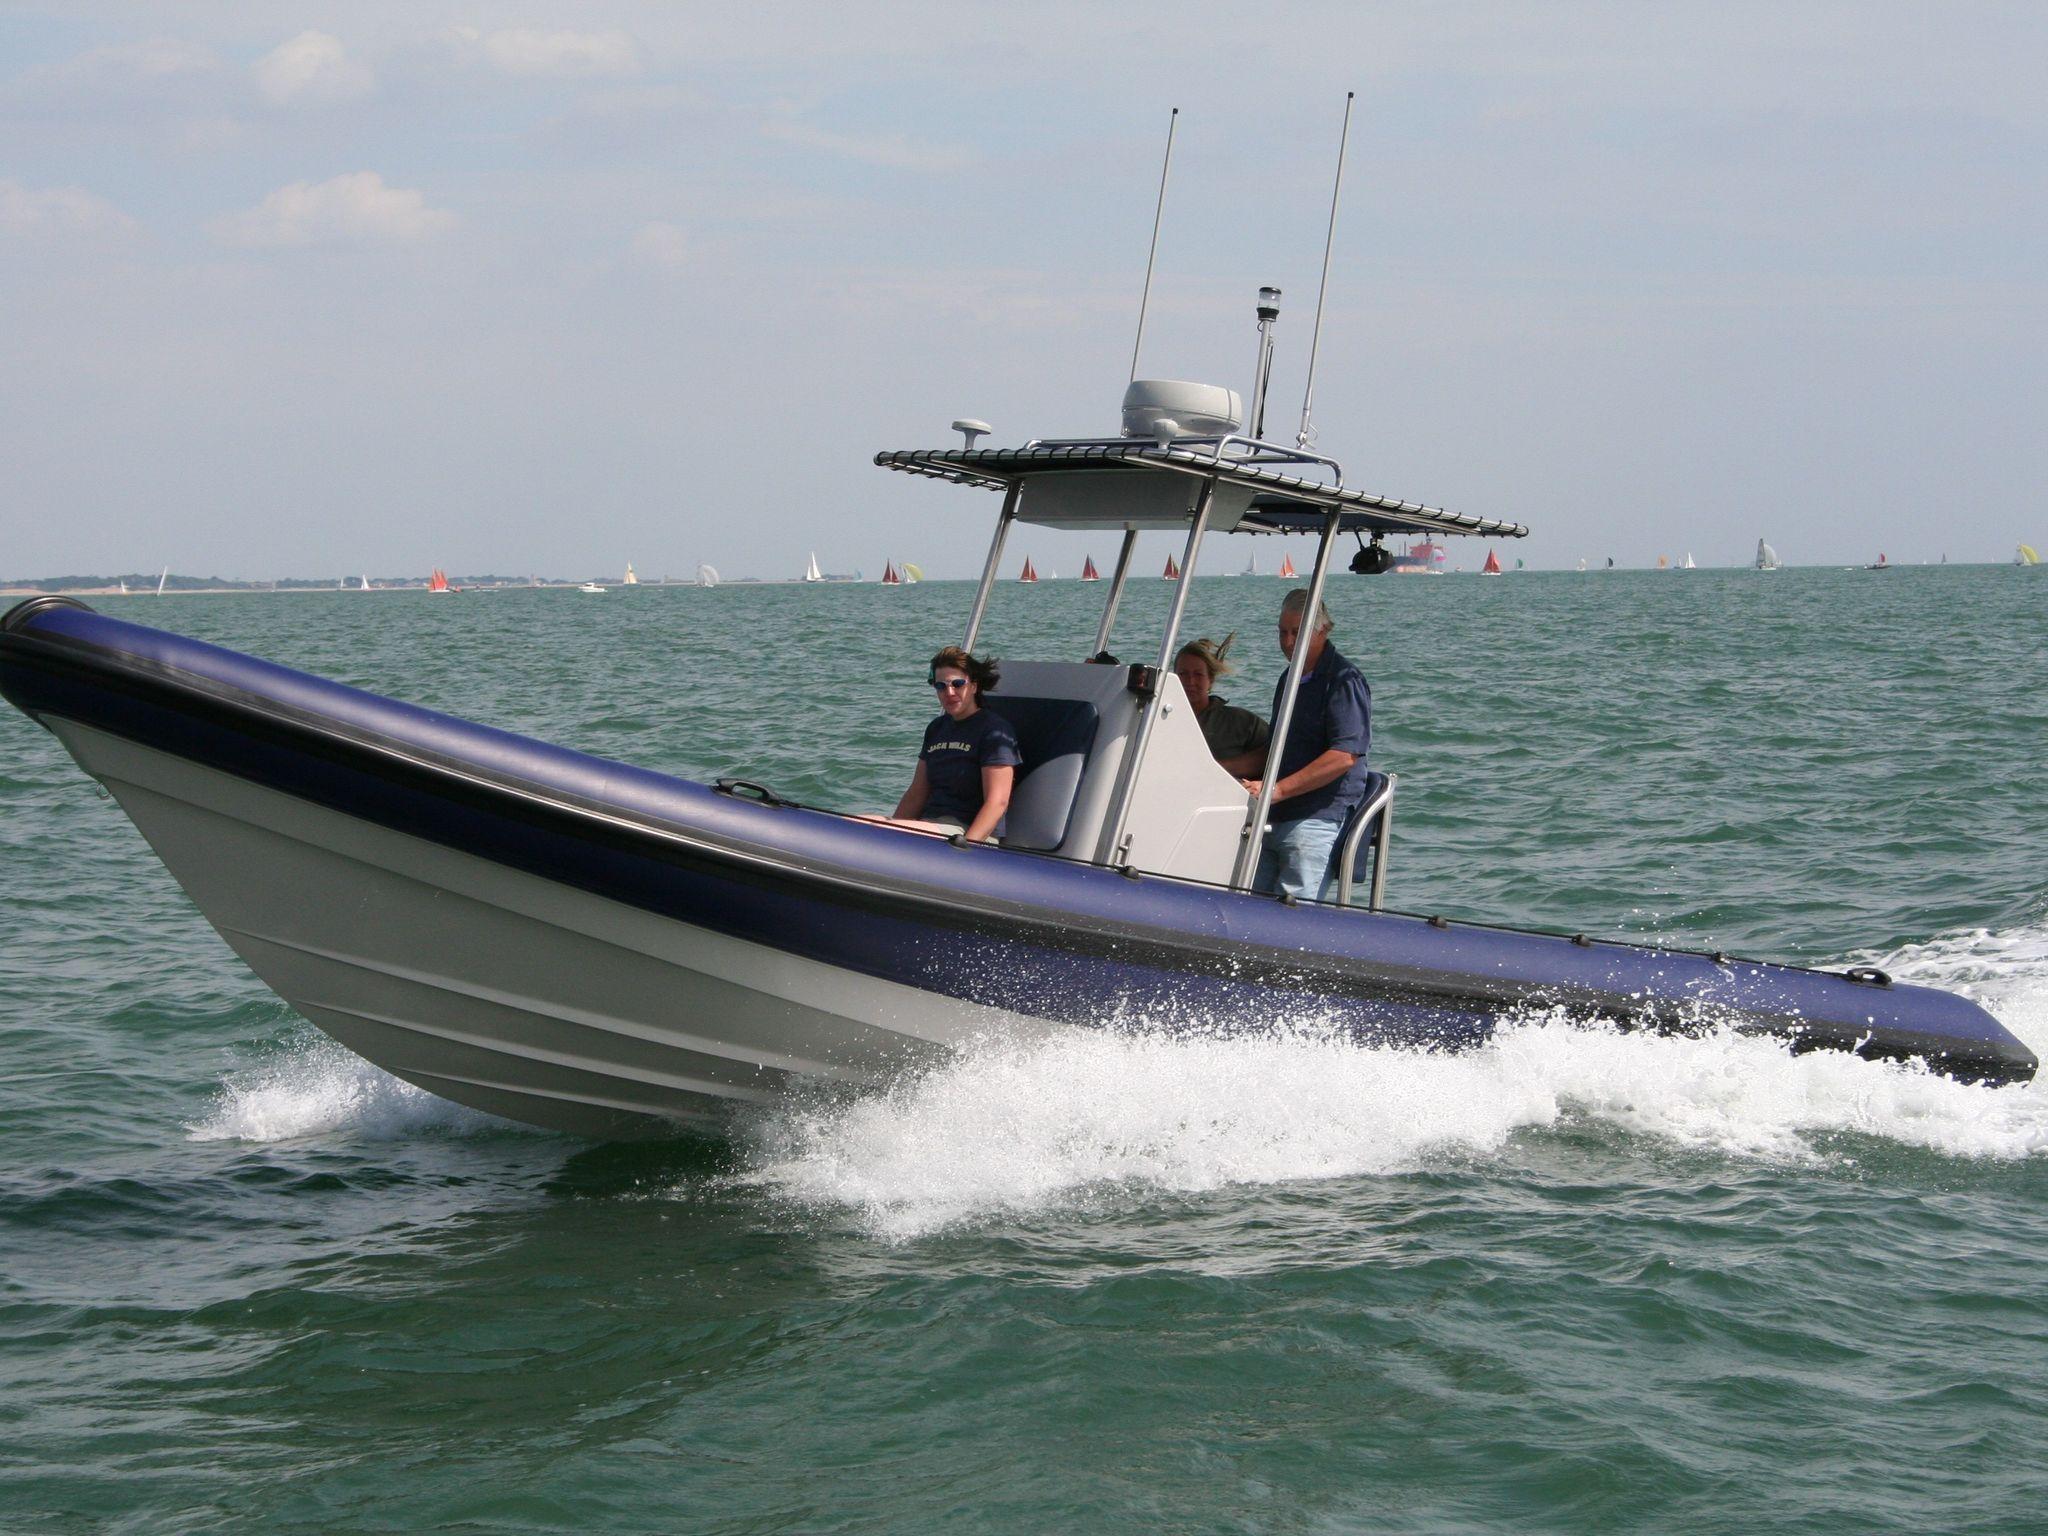 South Boats 9m RIB